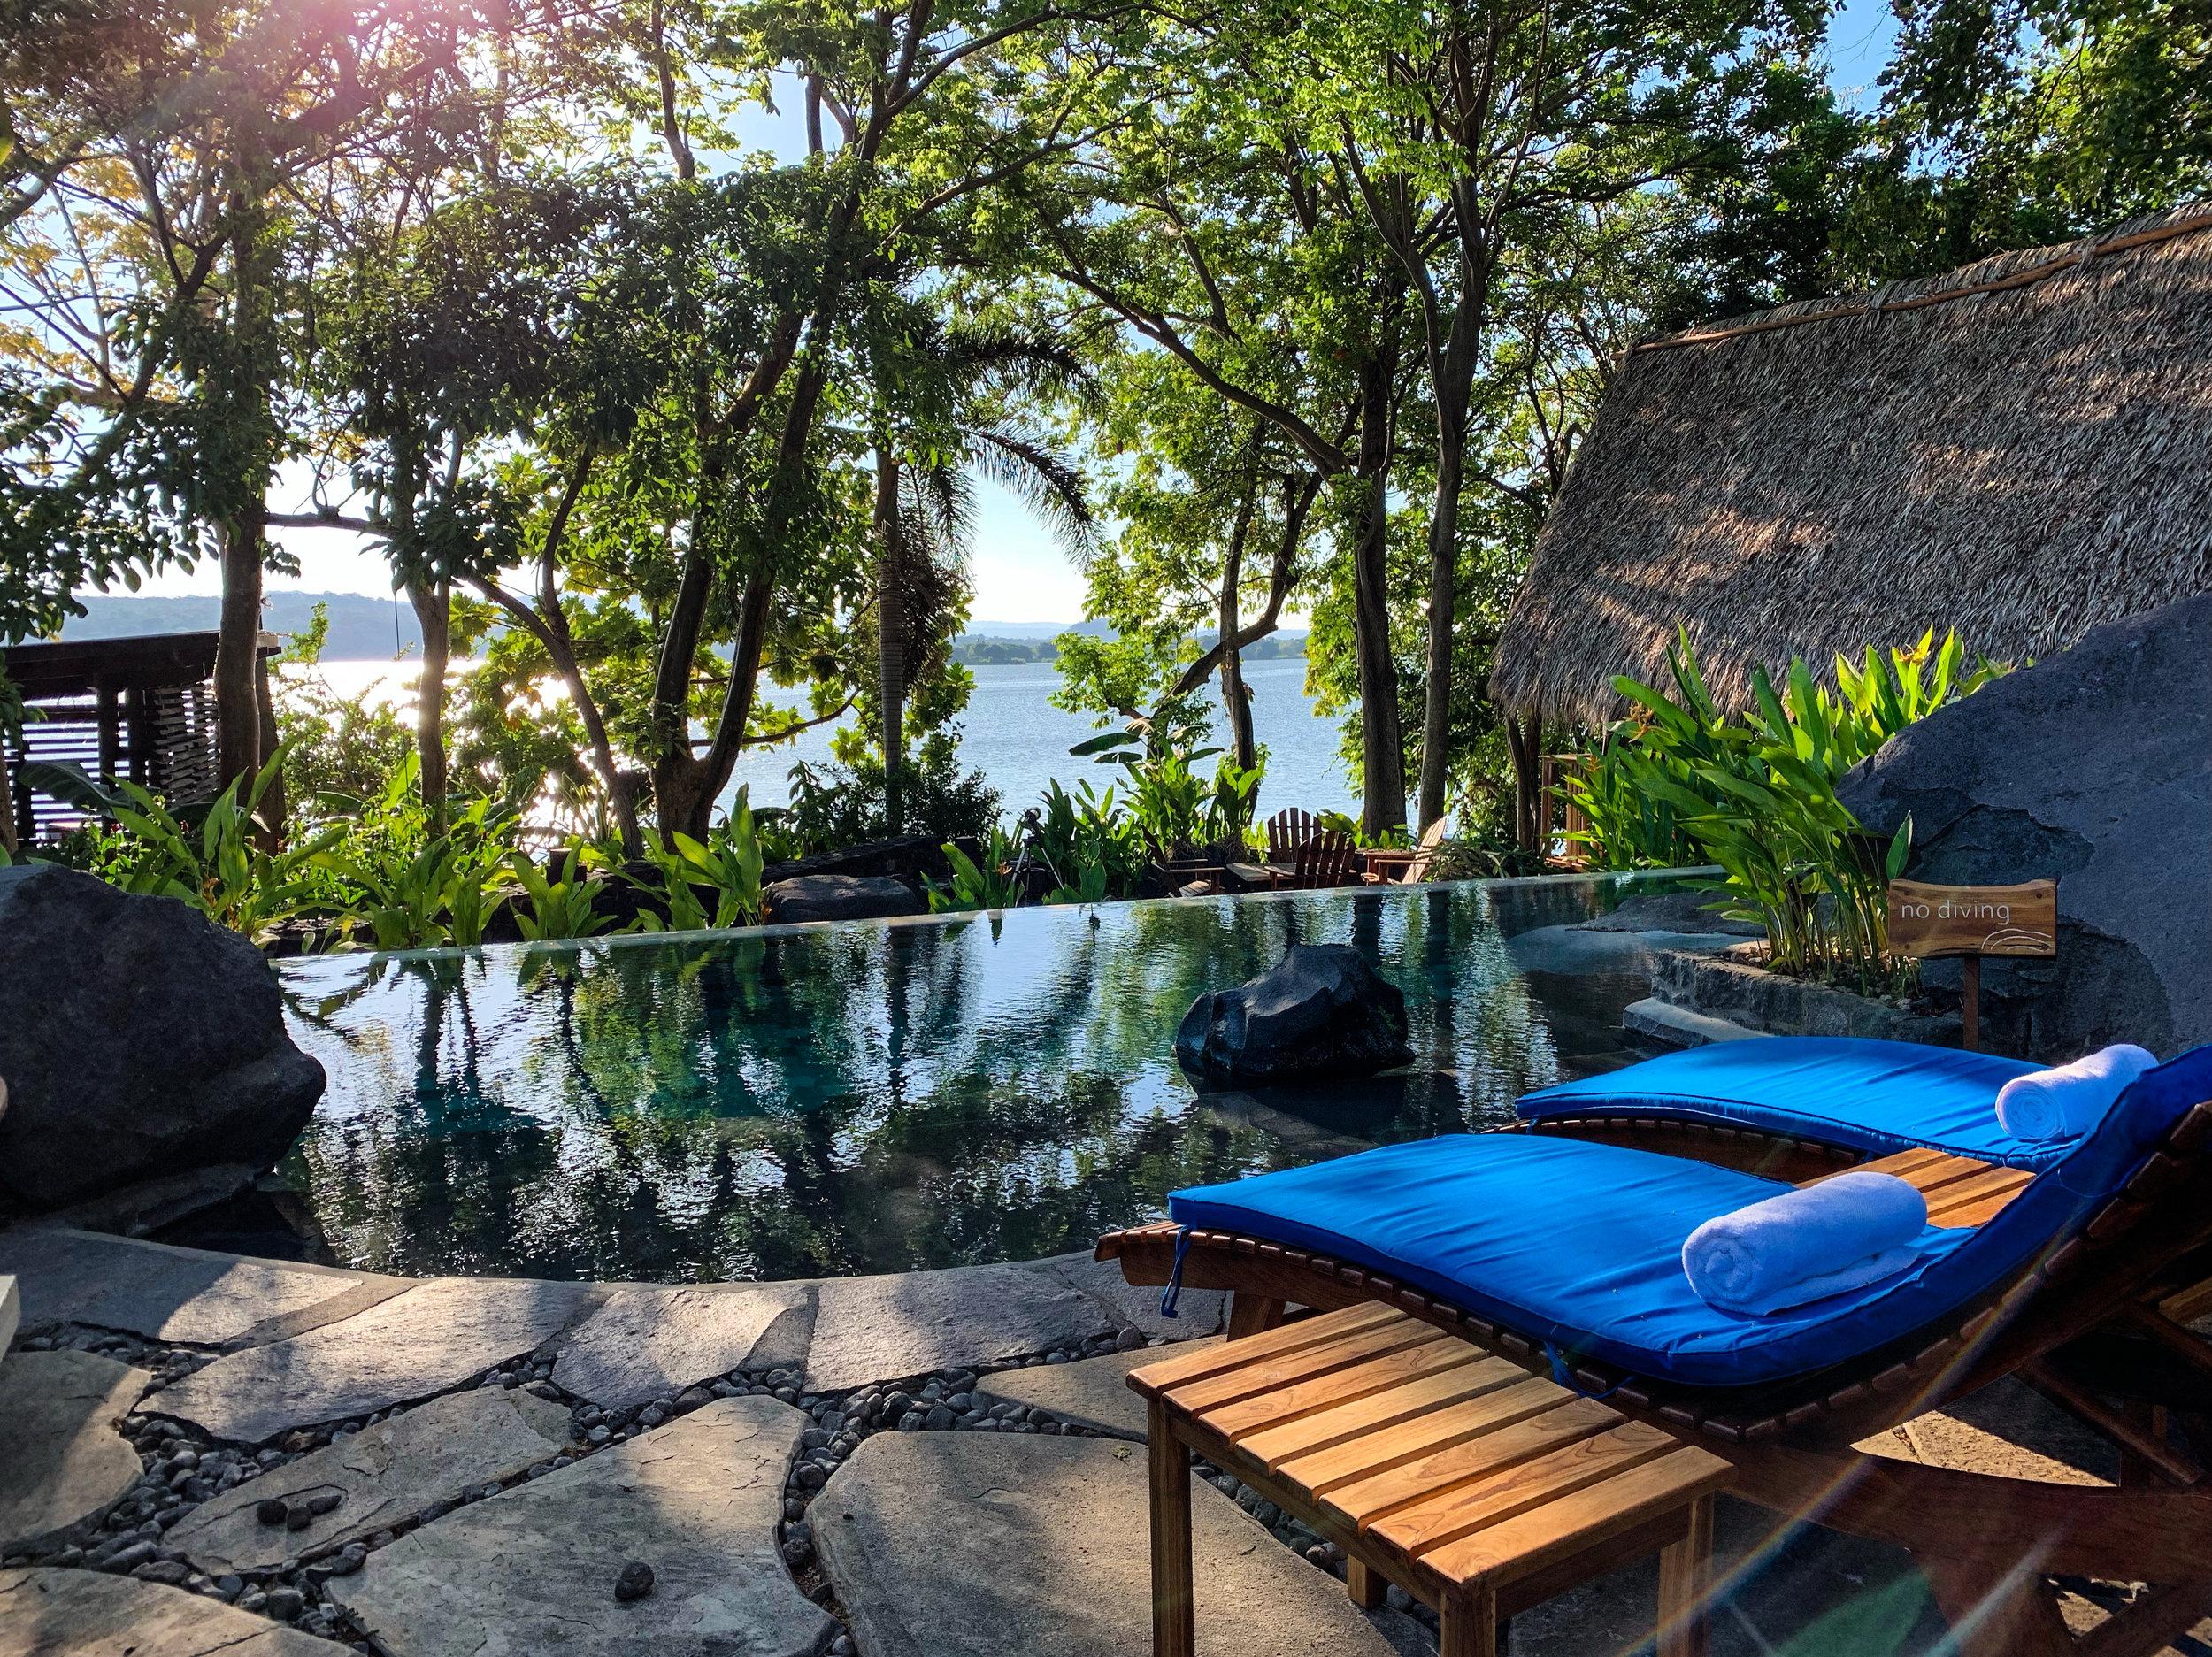 Serene lake views from the pool deck at Jicaro Island Lodge.